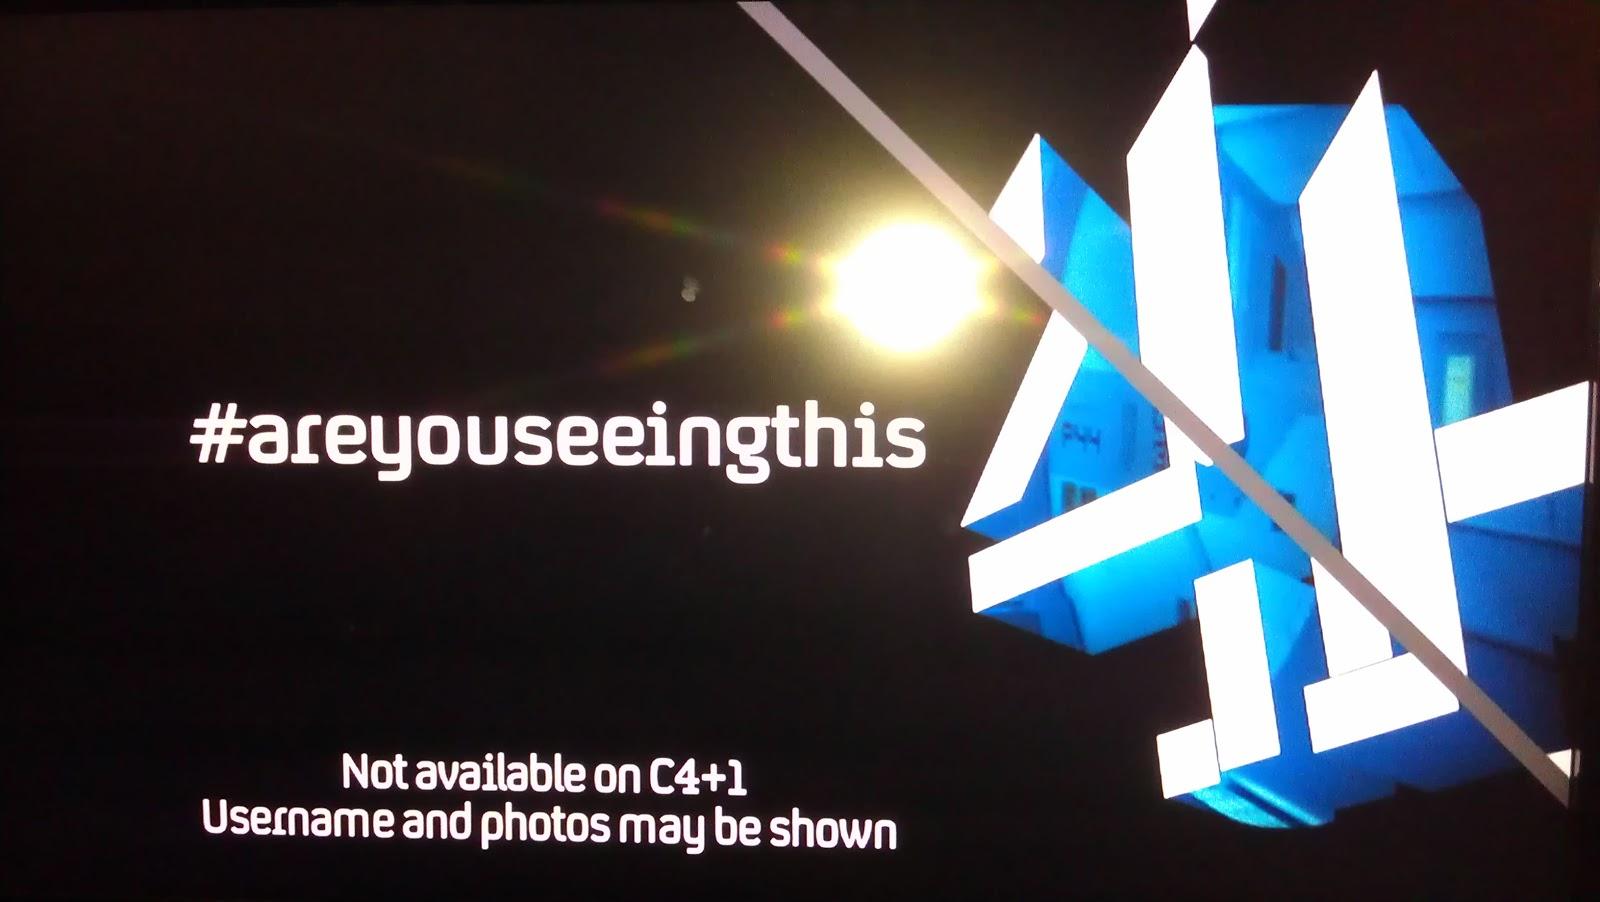 http://2.bp.blogspot.com/-AMclKKgUYD4/T55NOshf7lI/AAAAAAAAAz0/yjvb1ufXHOk/s1600/Are+You+Seeing+This+C4+Prometheus.jpg